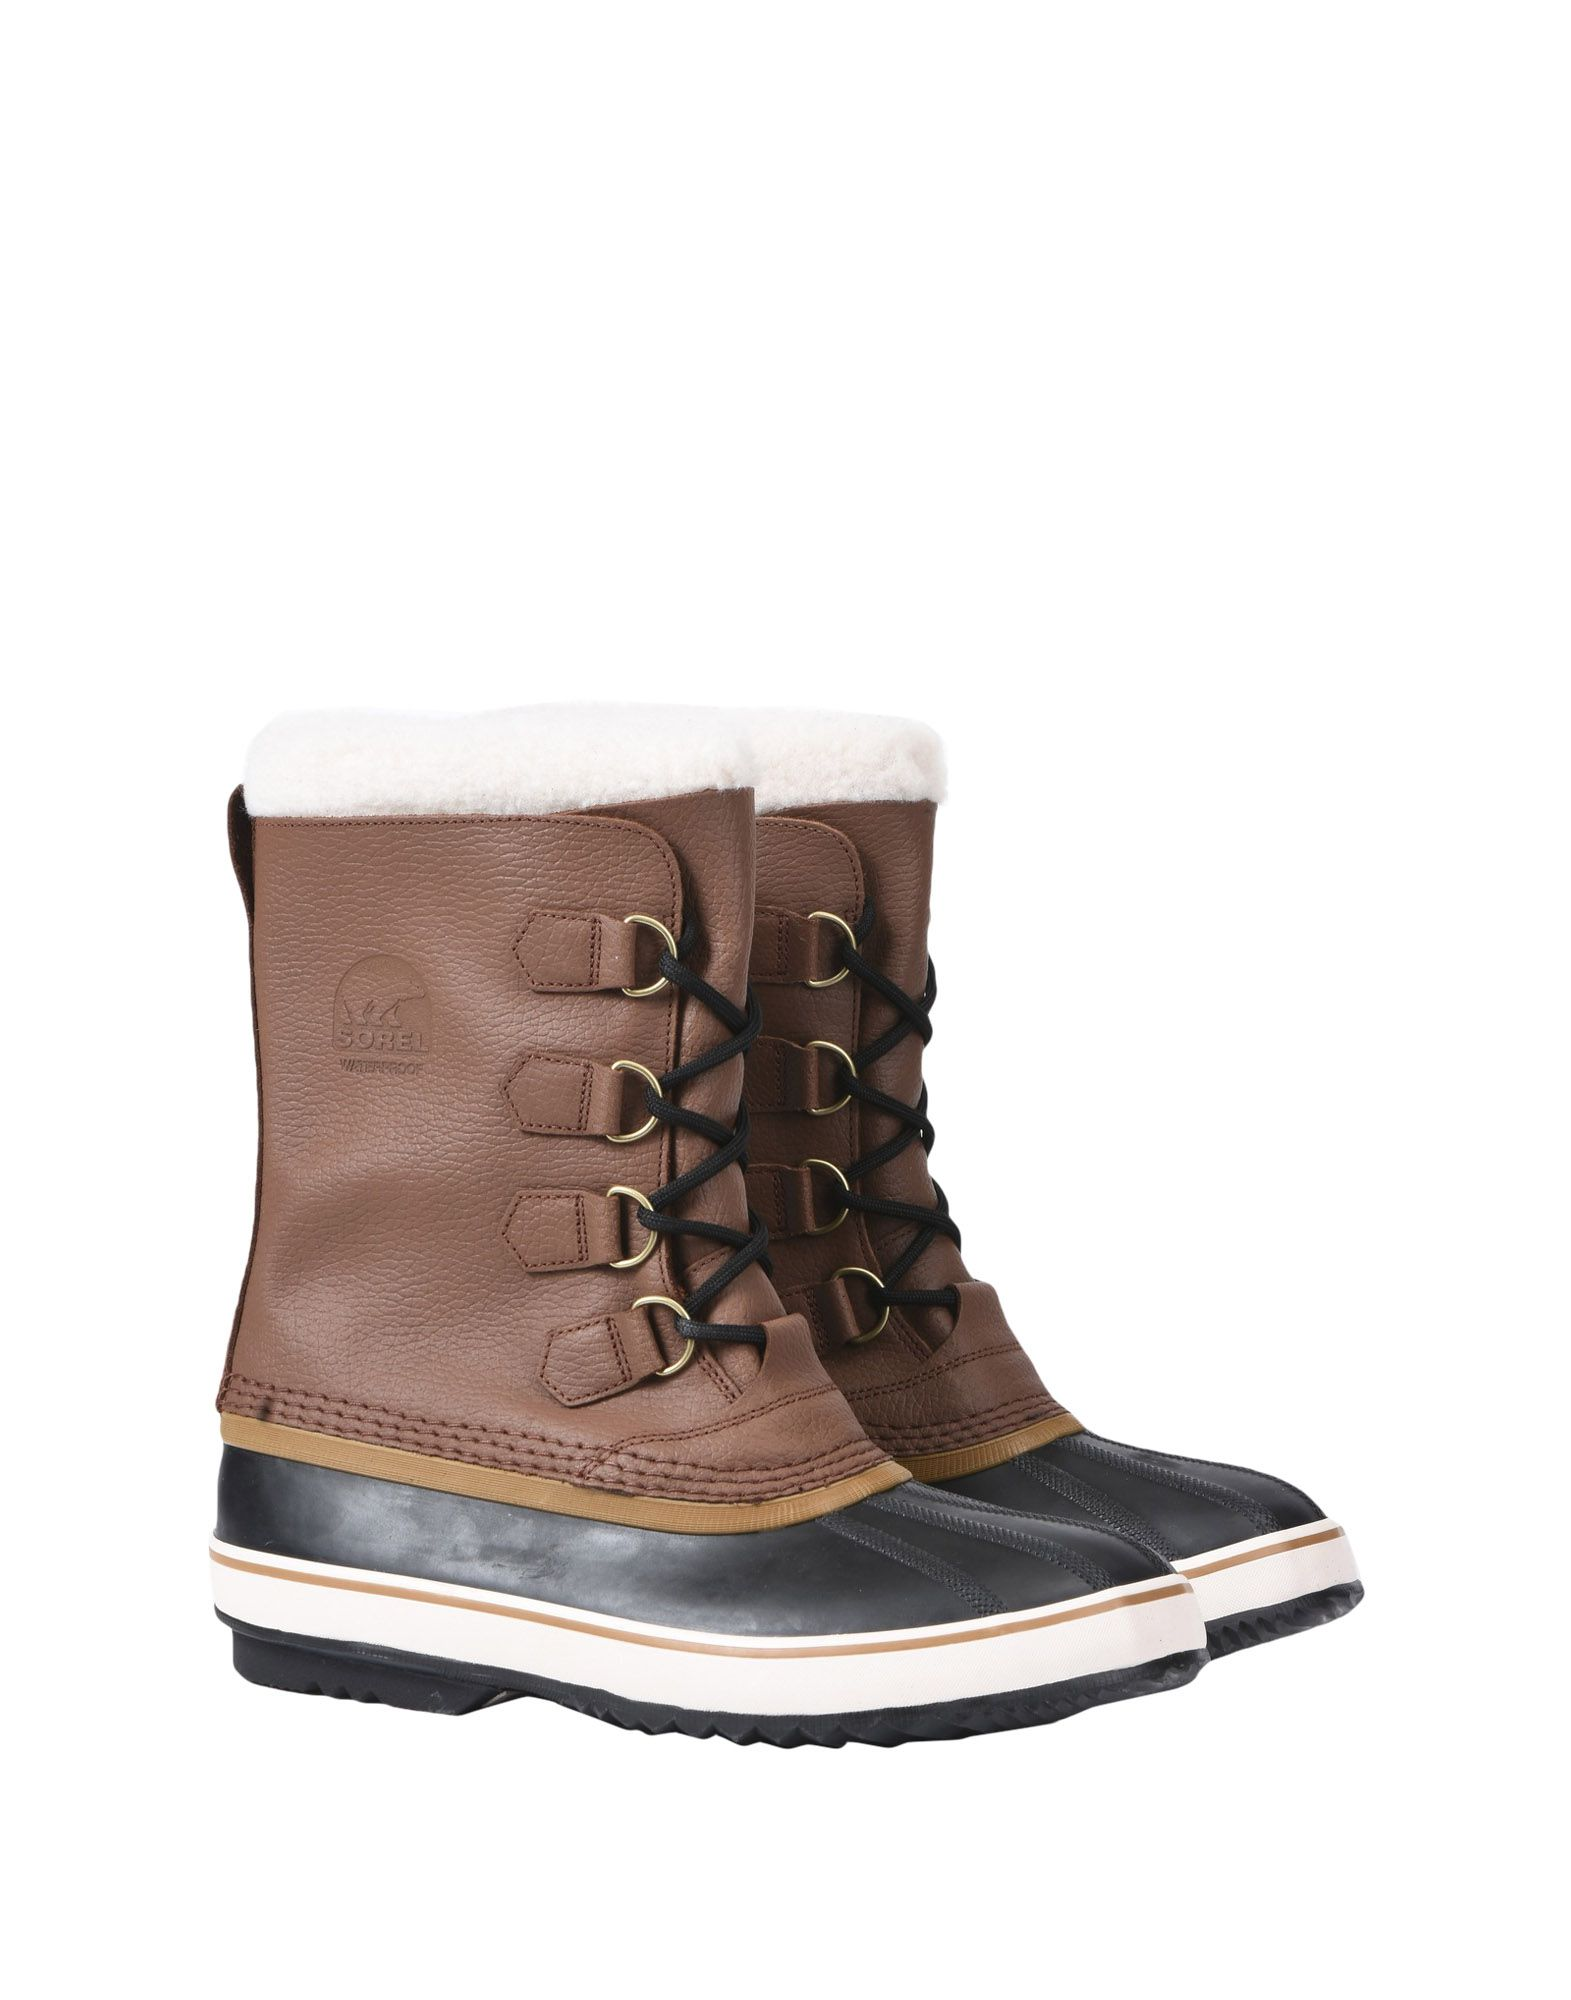 Sorel 1964 Pac T  Schuhe 11327810UV Gute Qualität beliebte Schuhe  ef7096